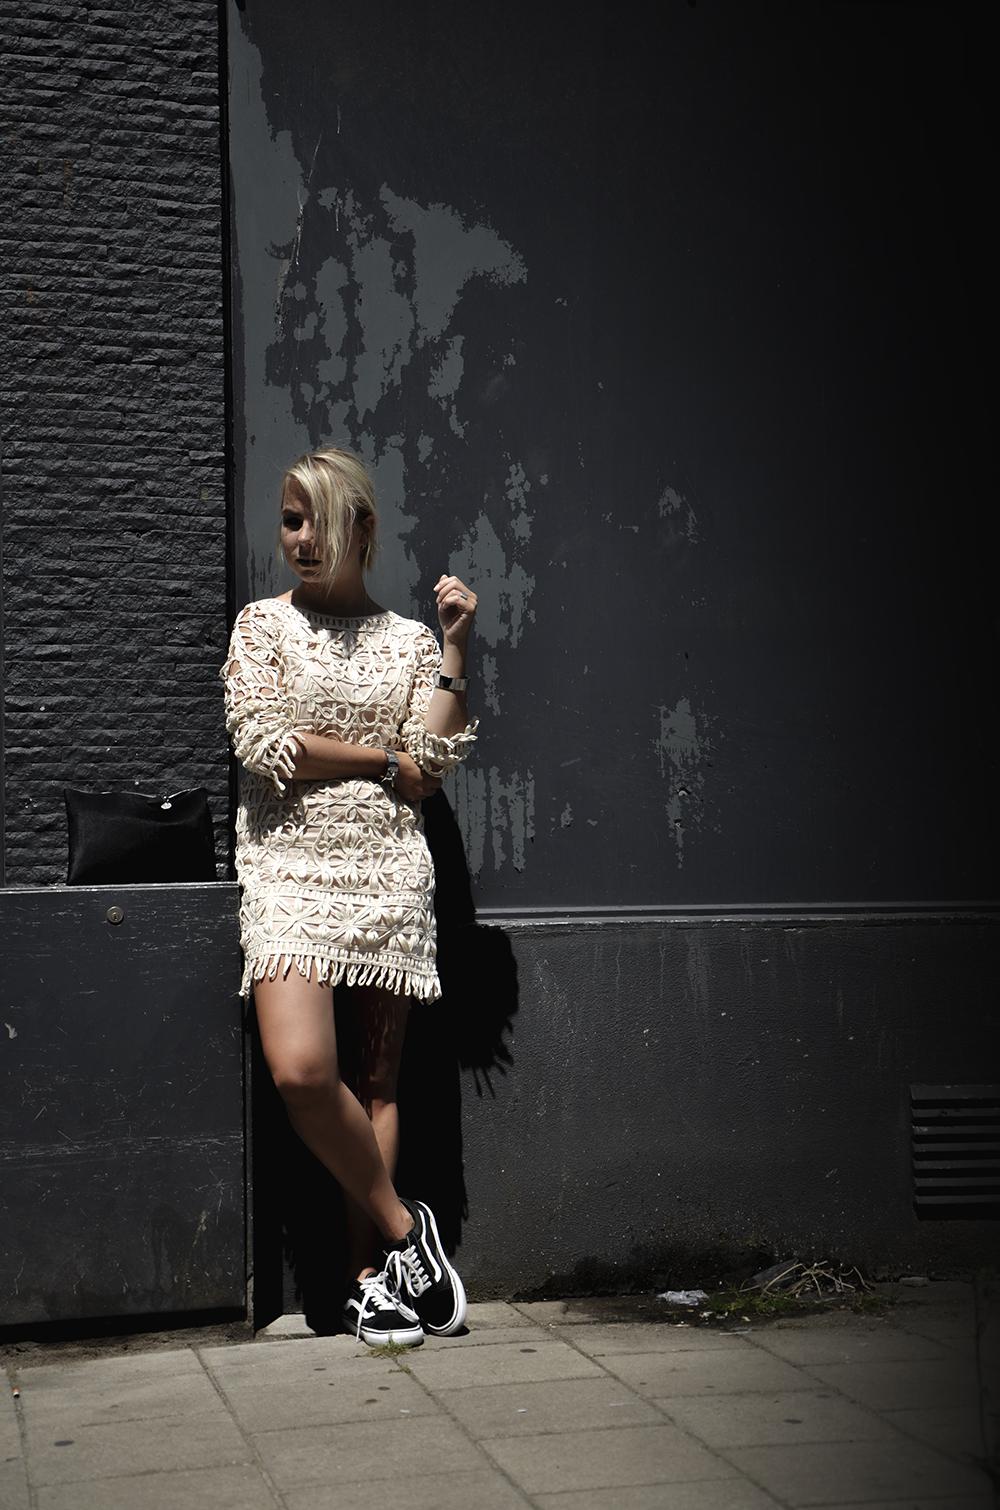 39a878e3433 boho chic outfit thpshop boundcuffs vans oldskool mango dress